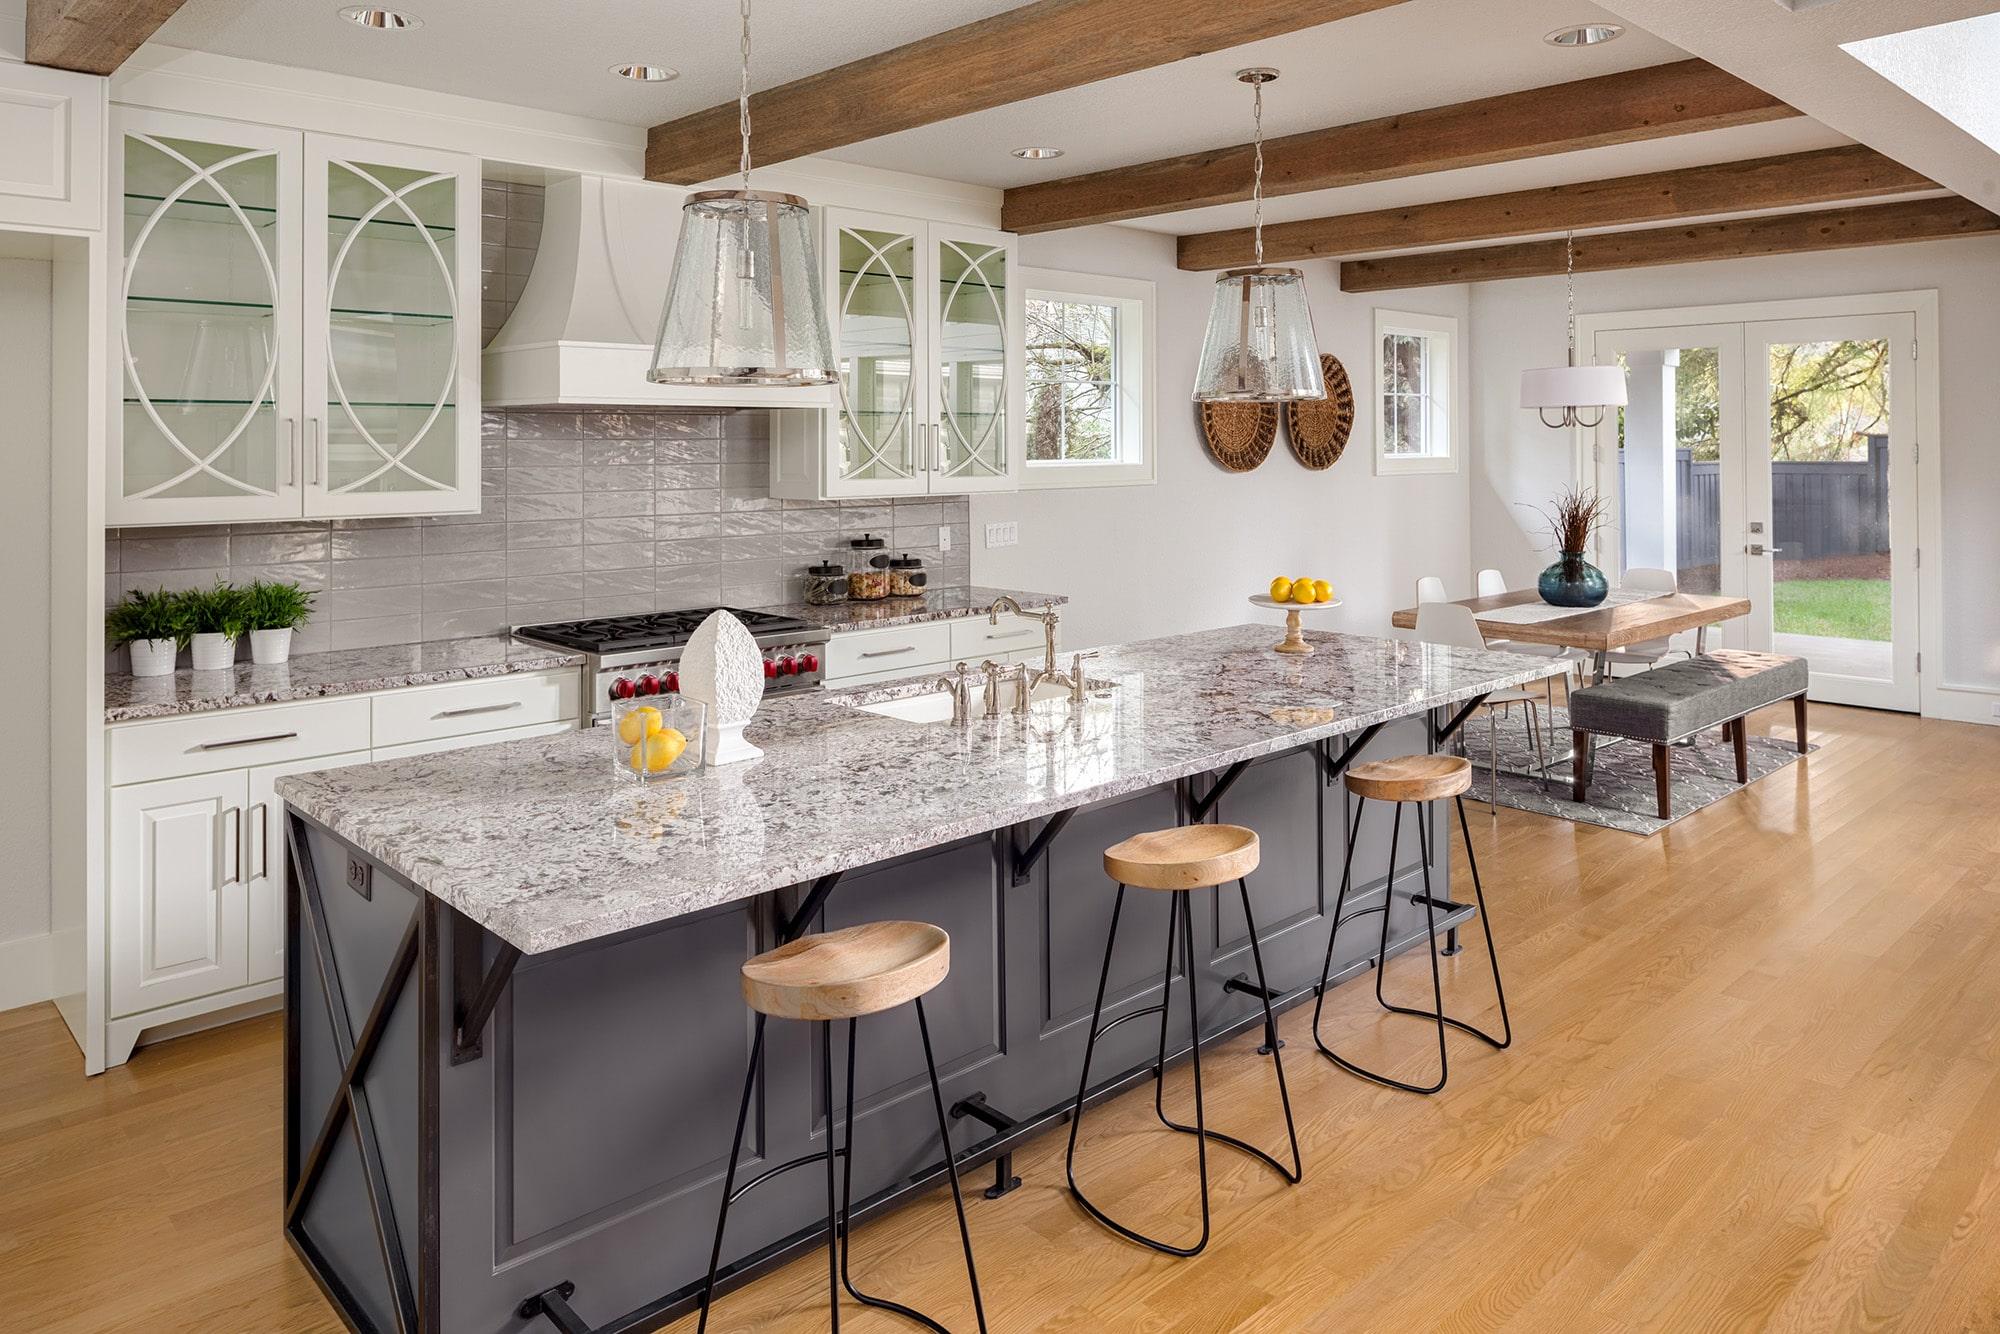 kitchen craftsmen kitchen designer stavros kitchen renovation farmhouse